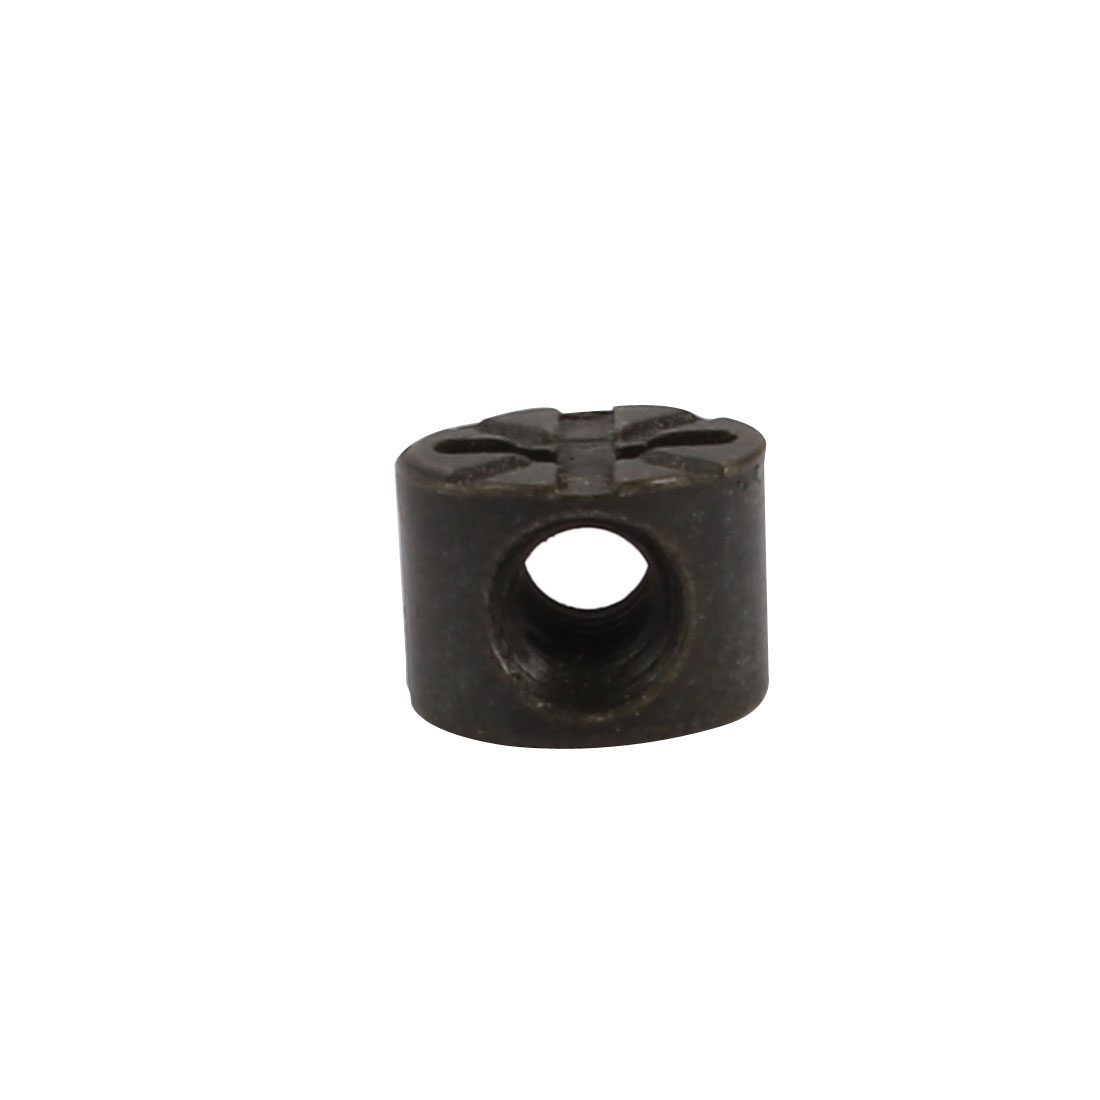 "40pcs 5/32"" Thread 7mm Length Zinc Alloy Pozidriv Drive Cross Dowel Nut Black - image 1 de 4"